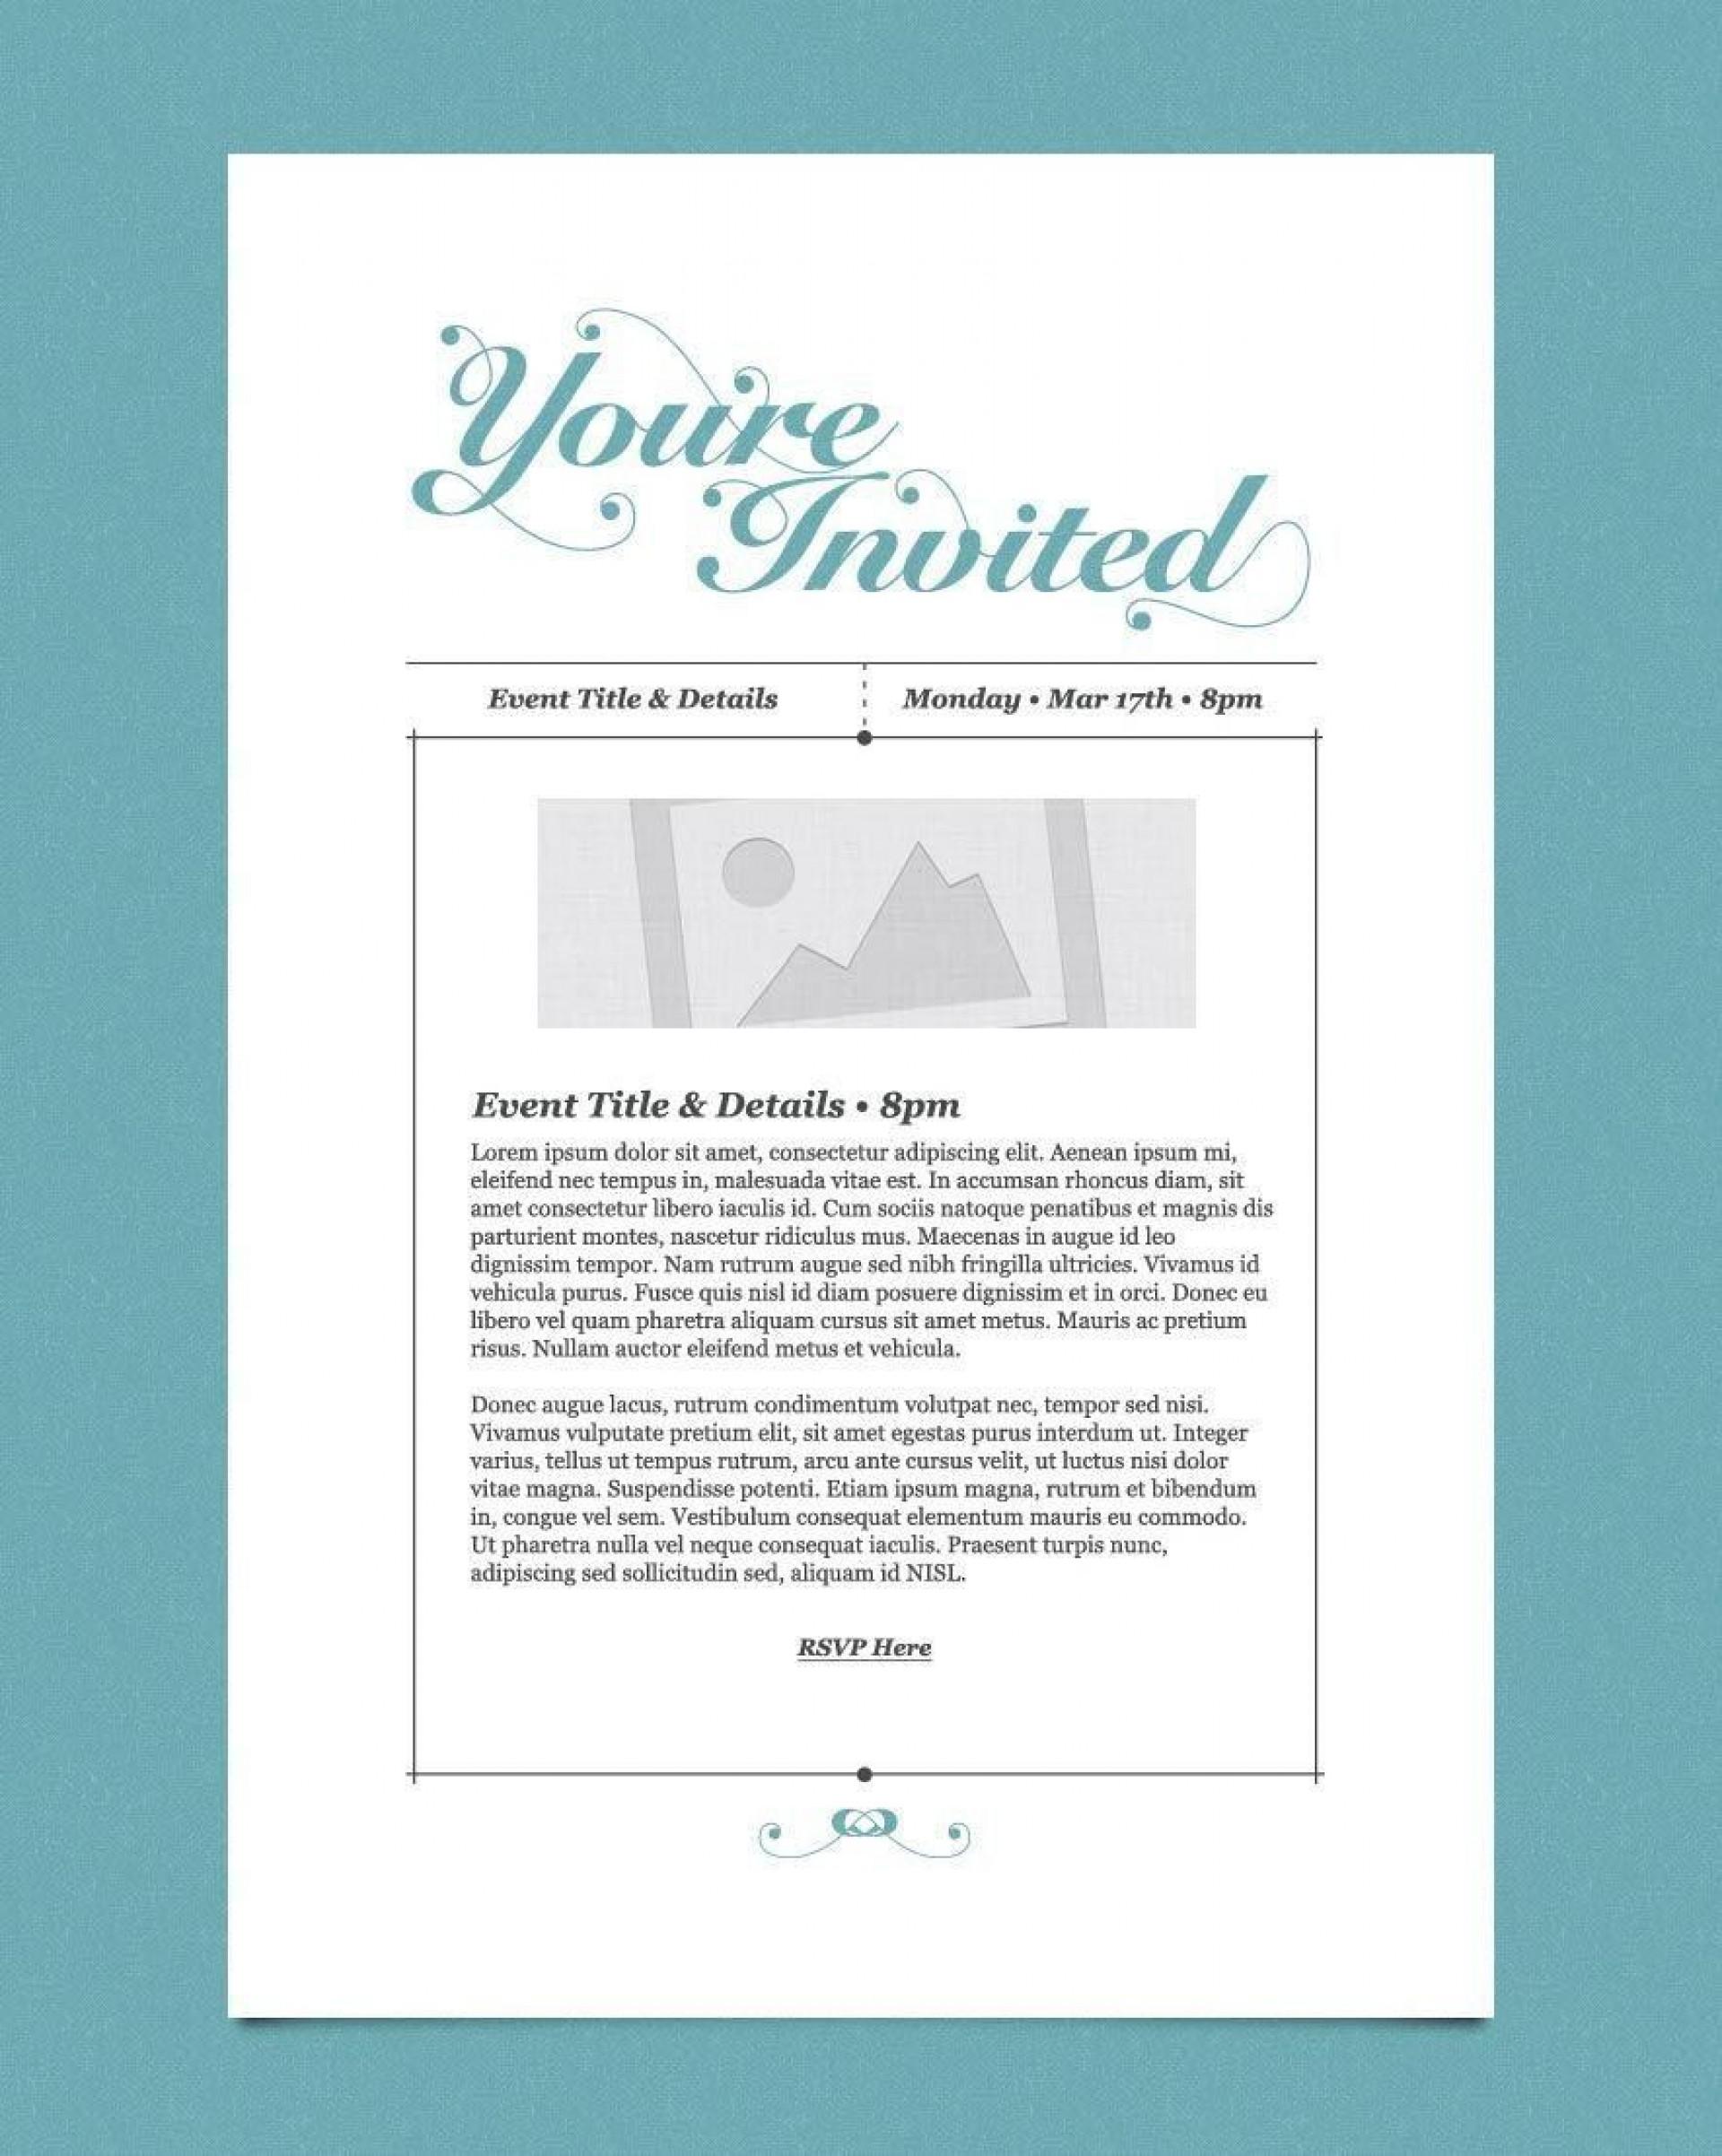 002 Awful Free Email Invite Template Idea  Templates Christma1920